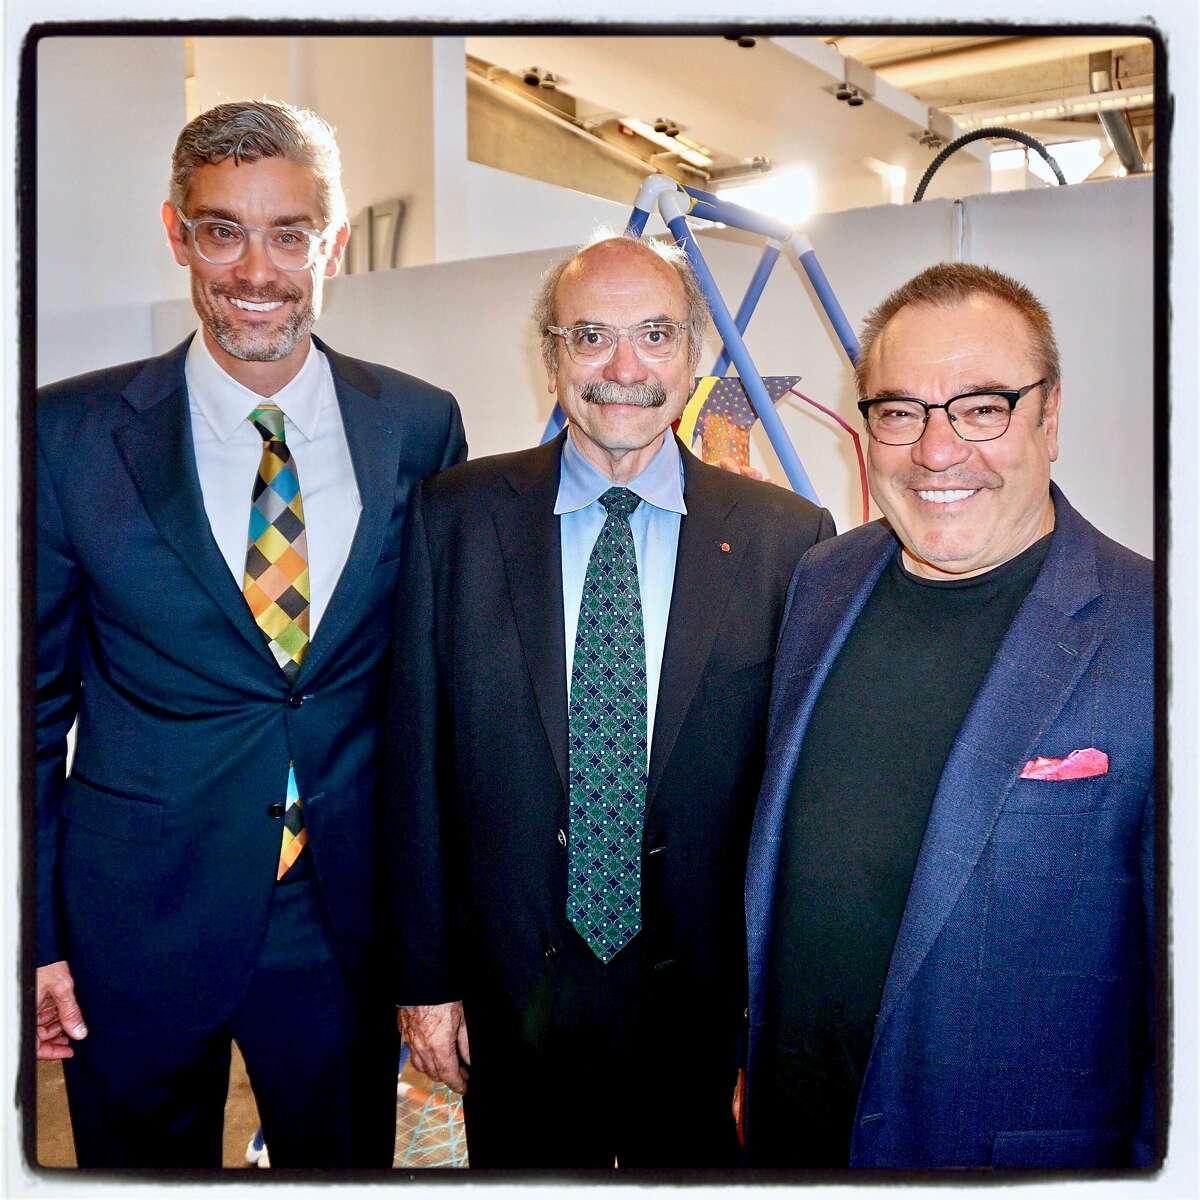 Exploratorium Director Chris Flink (left) with IDEO founder David Kelley and CCA trustee Stanlee Gatti. May 23, 2017.